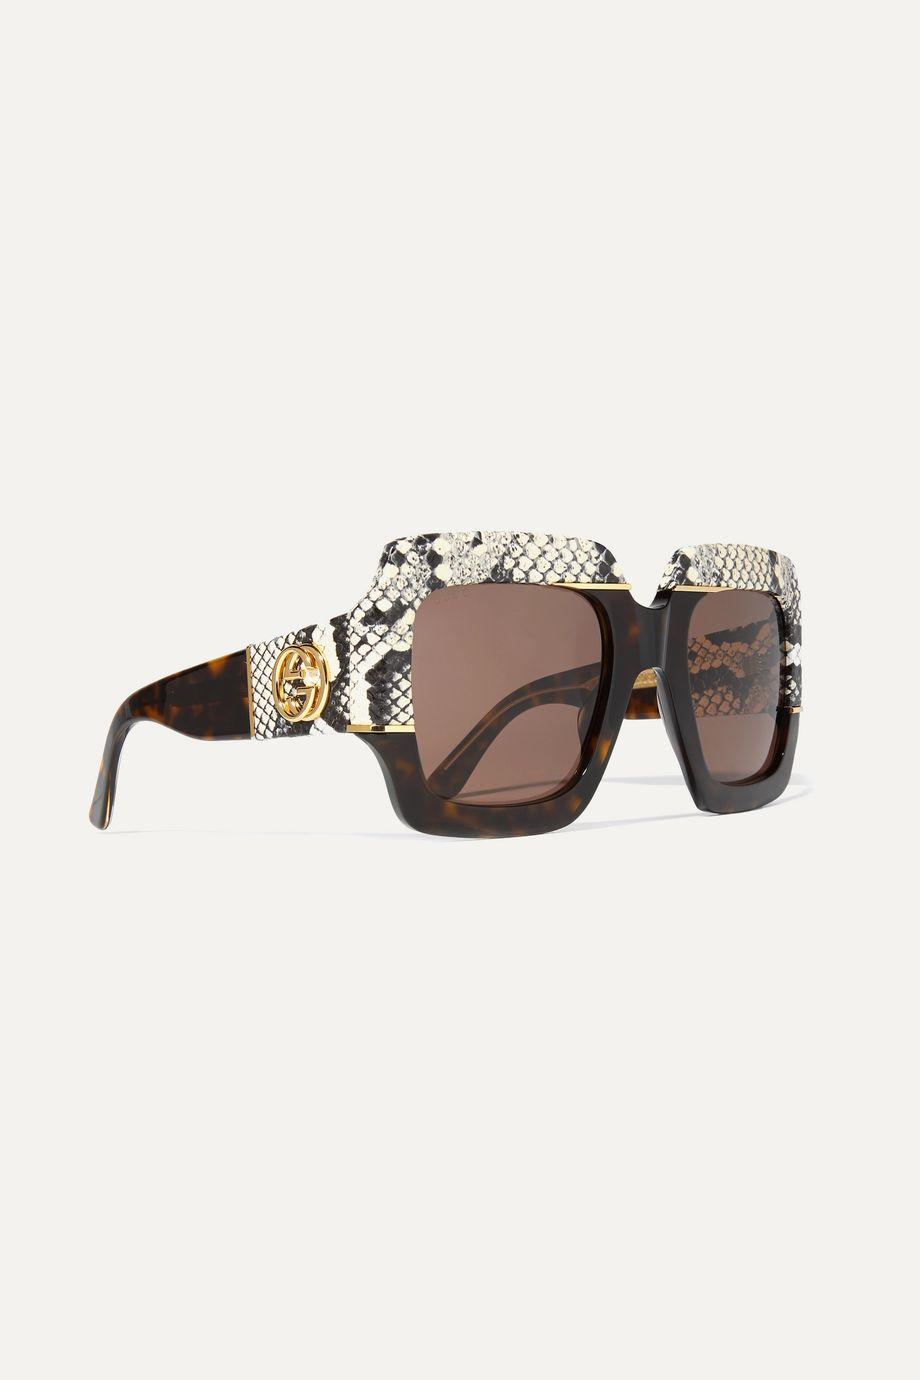 Gucci Oversized square-frame watersnake-trimmed tortoiseshell acetate sunglasses